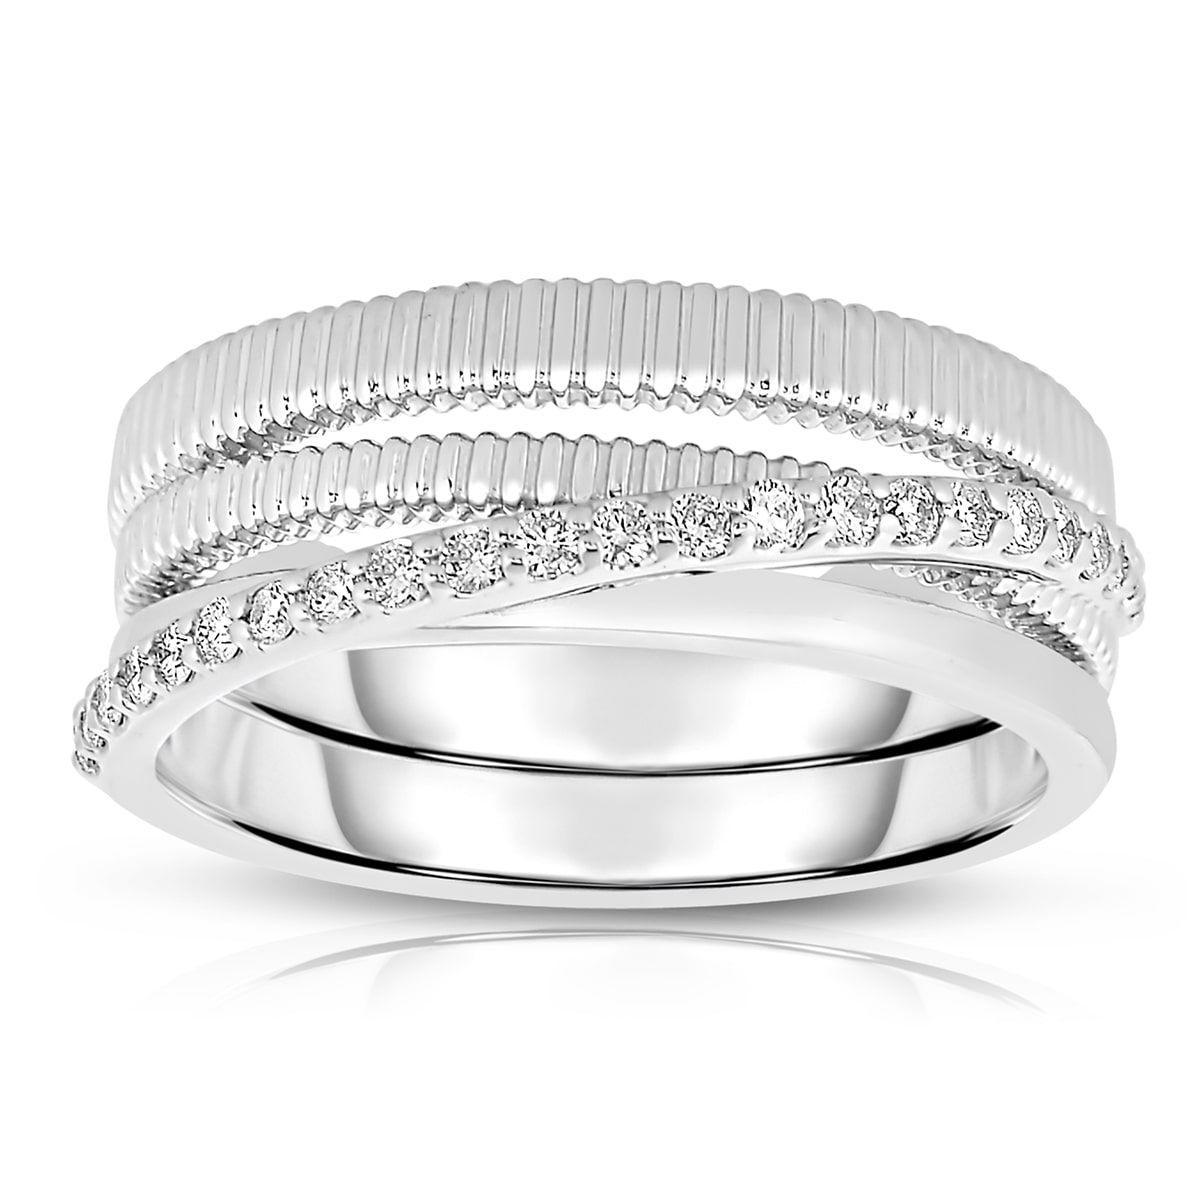 Eloquence 14k Gold 1/4ct TDW Diamond Multi-Row Ring